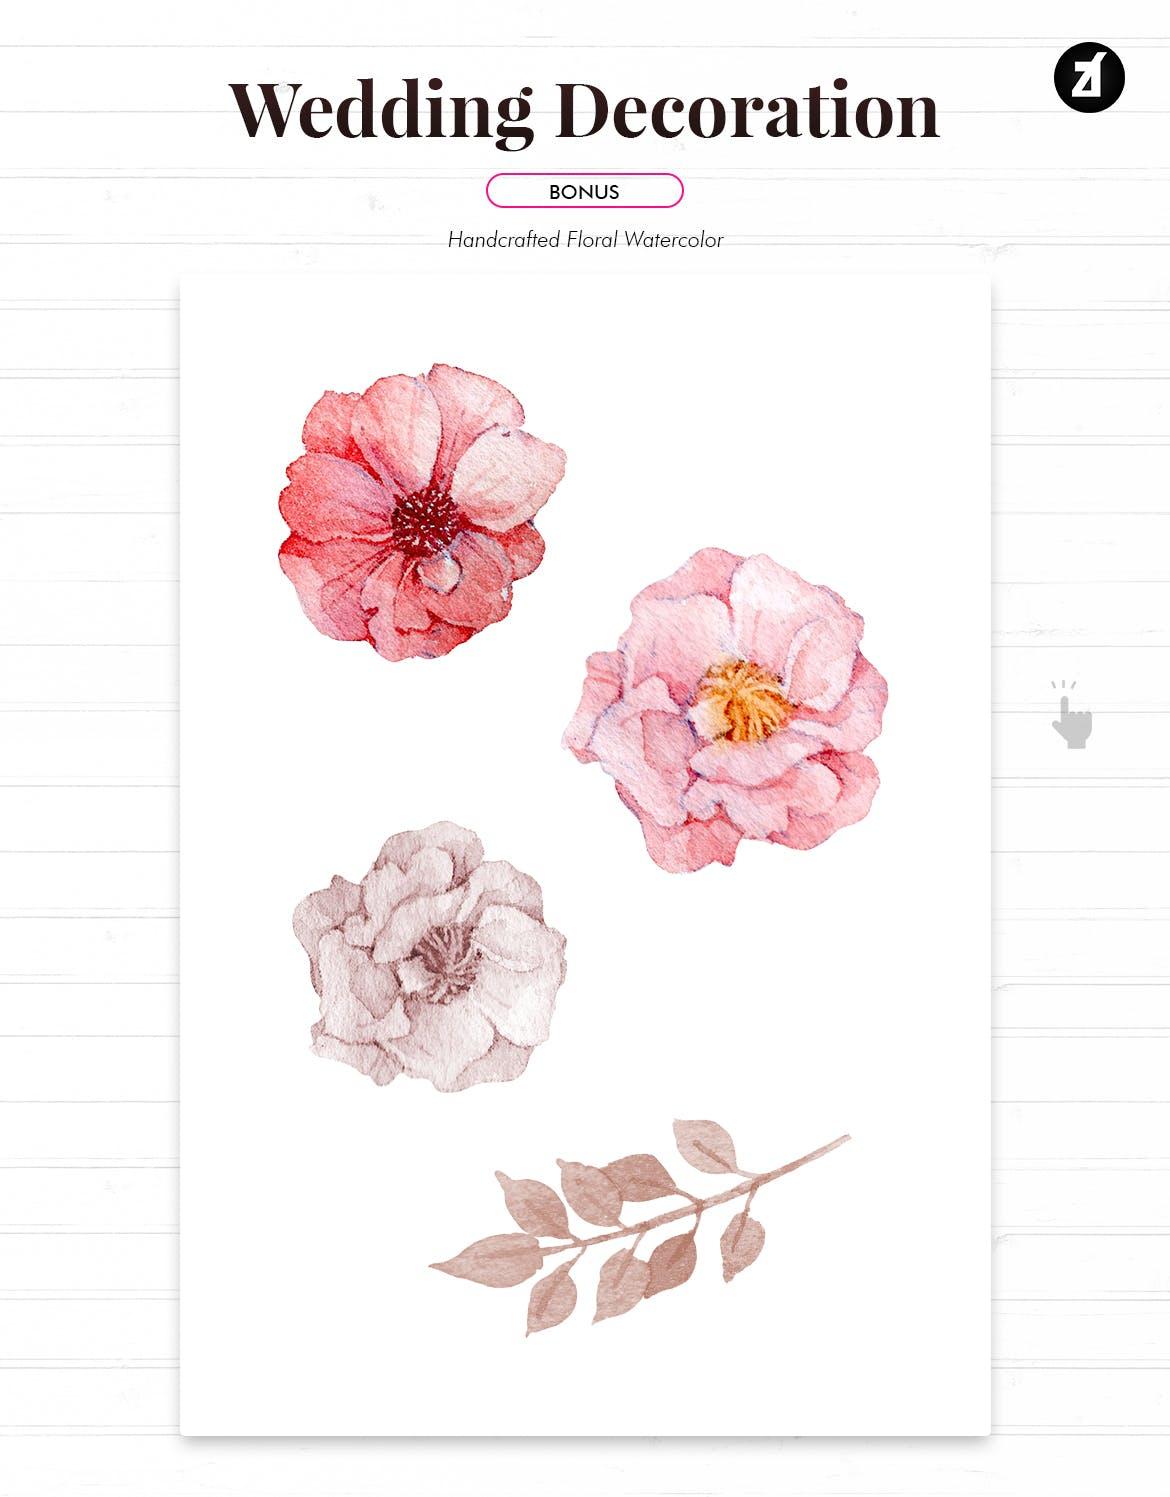 手绘水彩花卉效果婚礼邀请函贺卡卡片设计AI矢量模板 Floral Hand-drawn Watercolor Wedding Invitation插图(3)